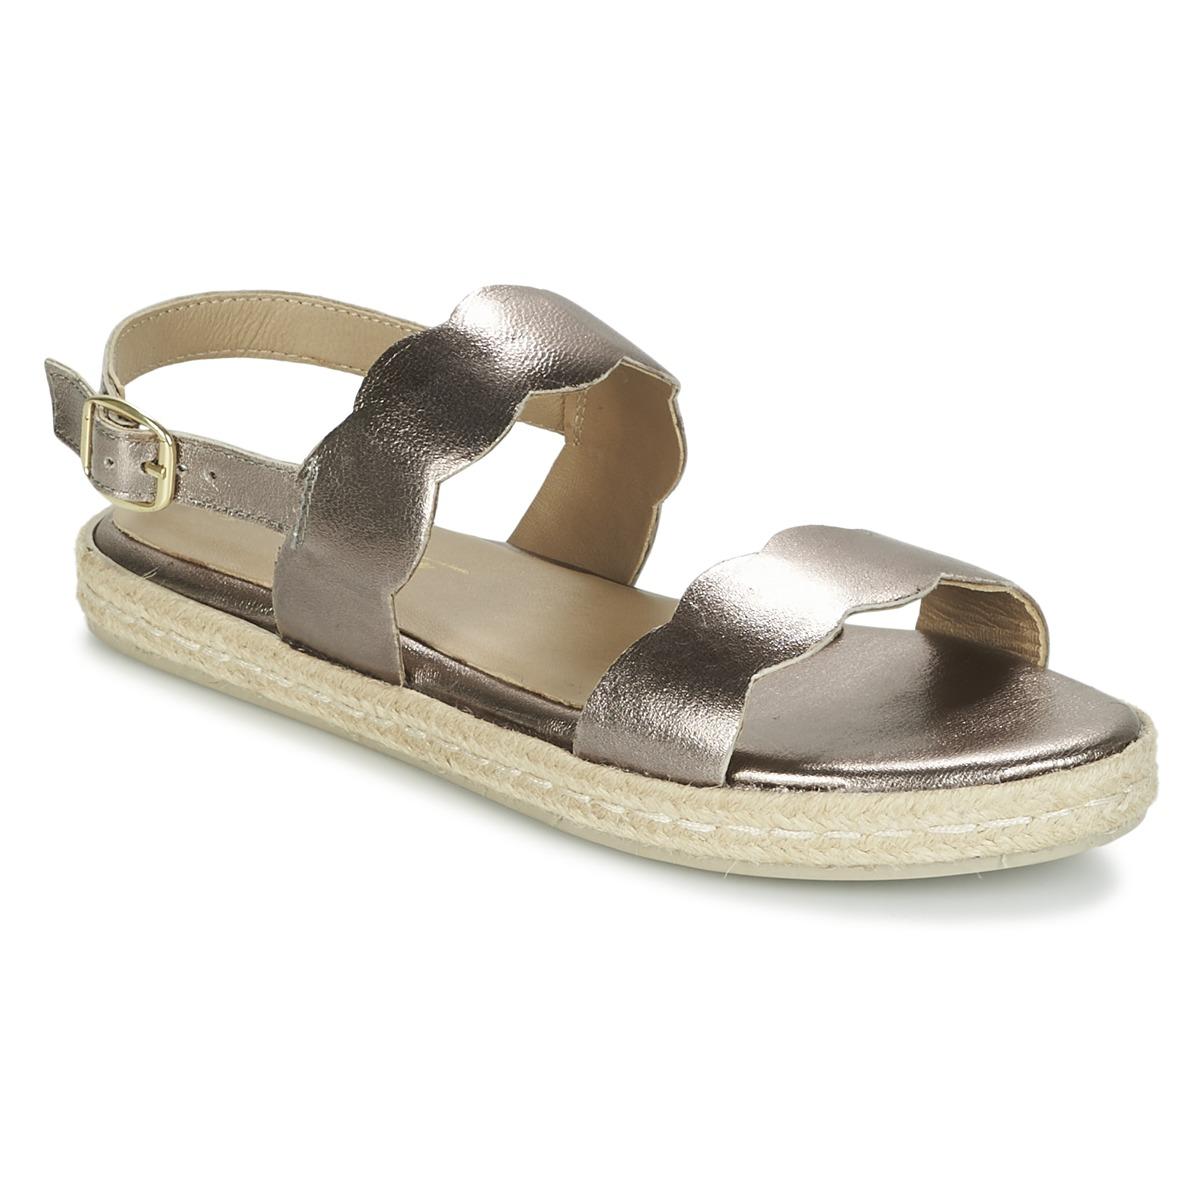 Betty London IKARO Silbern - Kostenloser Versand bei Spartoode ! - Schuhe Sandalen / Sandaletten Damen 32,99 €